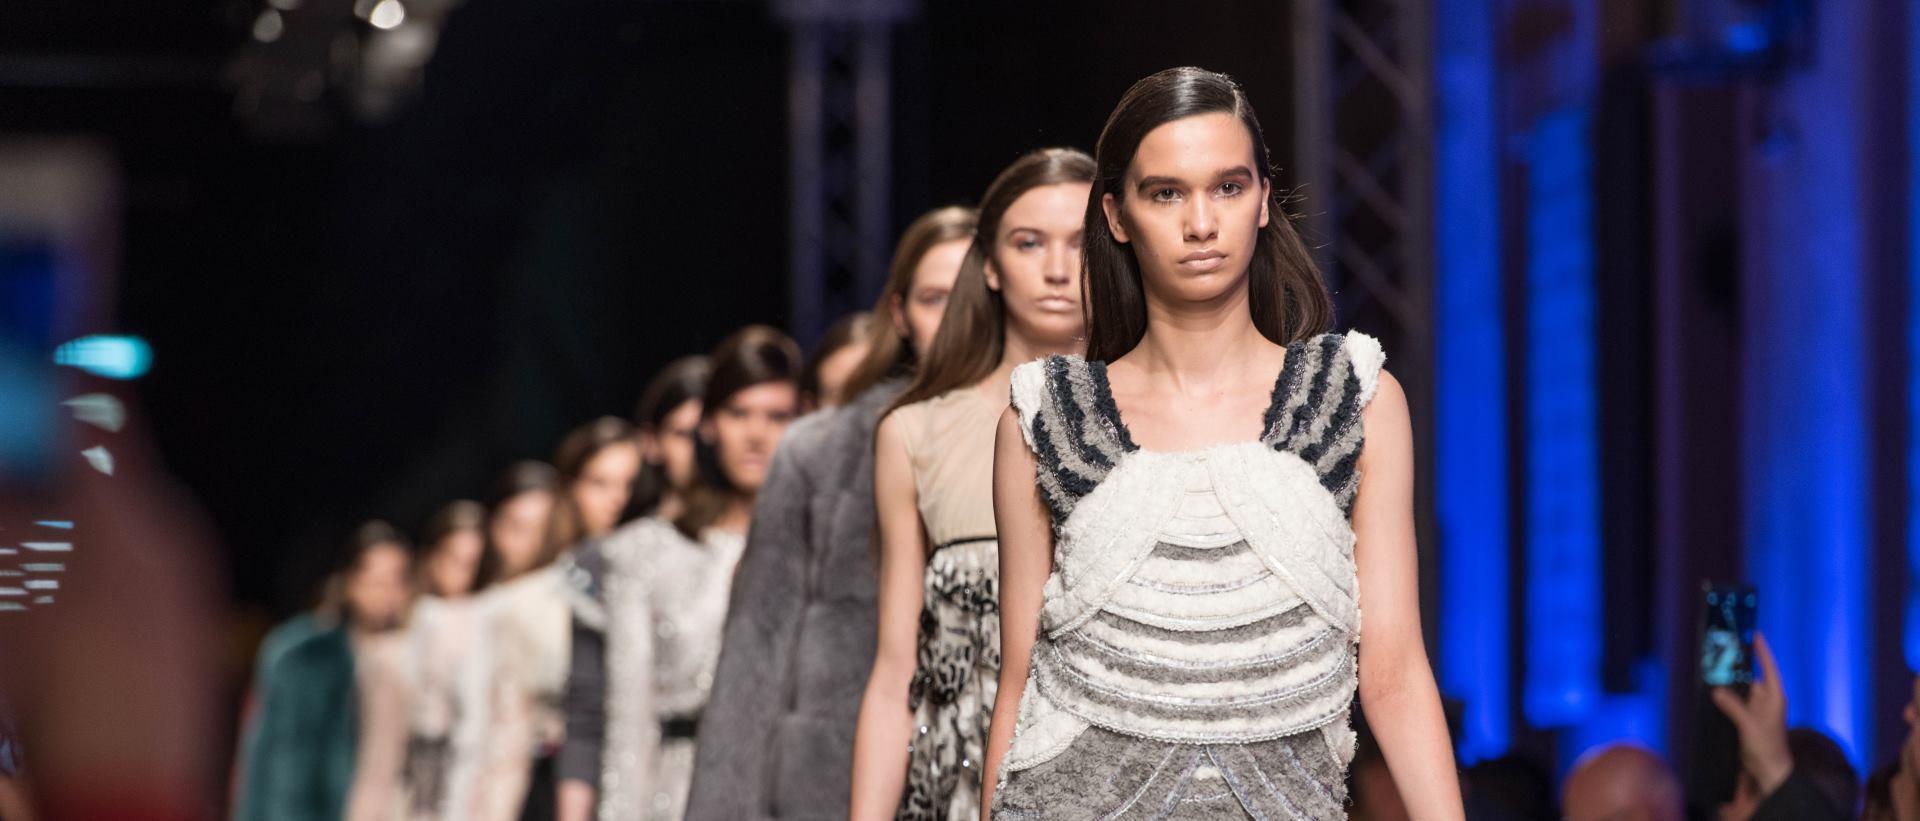 LEI LOU EXPRESS Glavni kolodvor postao modna pista nove kolekcije jesen/zima